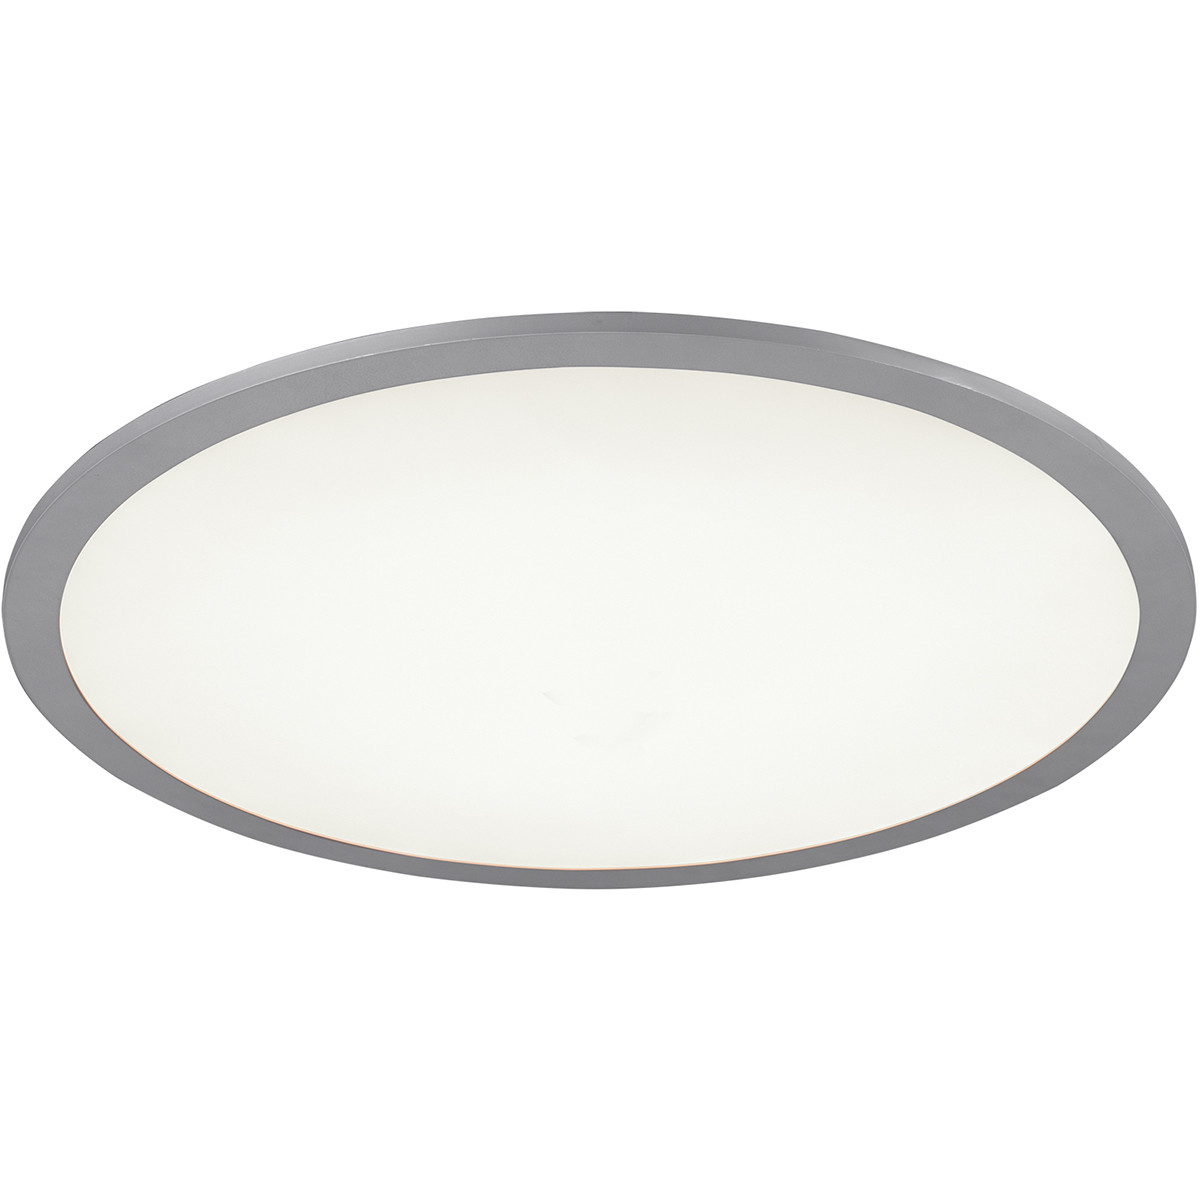 LED Plafondlamp WiZ - Smart LED - Trion Alineon - Slimme LED - Dimbaar - Aanpasbare Kleur - 22W - Ma